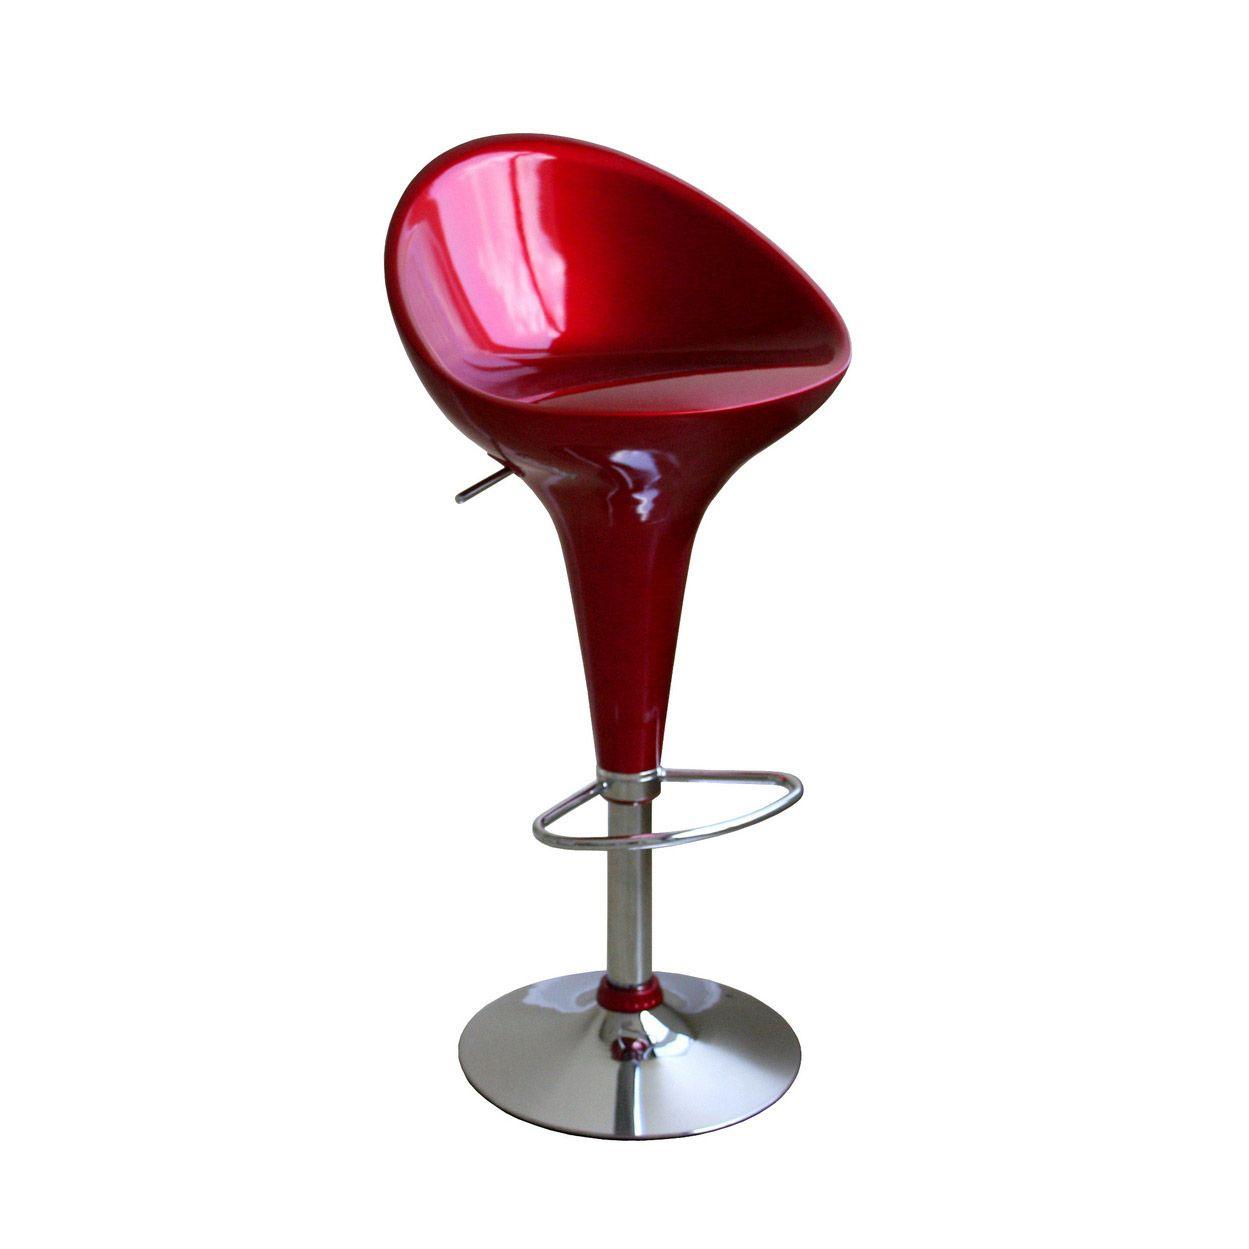 High Pedestal Barstool In Red Affordable Modern Furniture Adjustable Bar Stools Dot And Bo